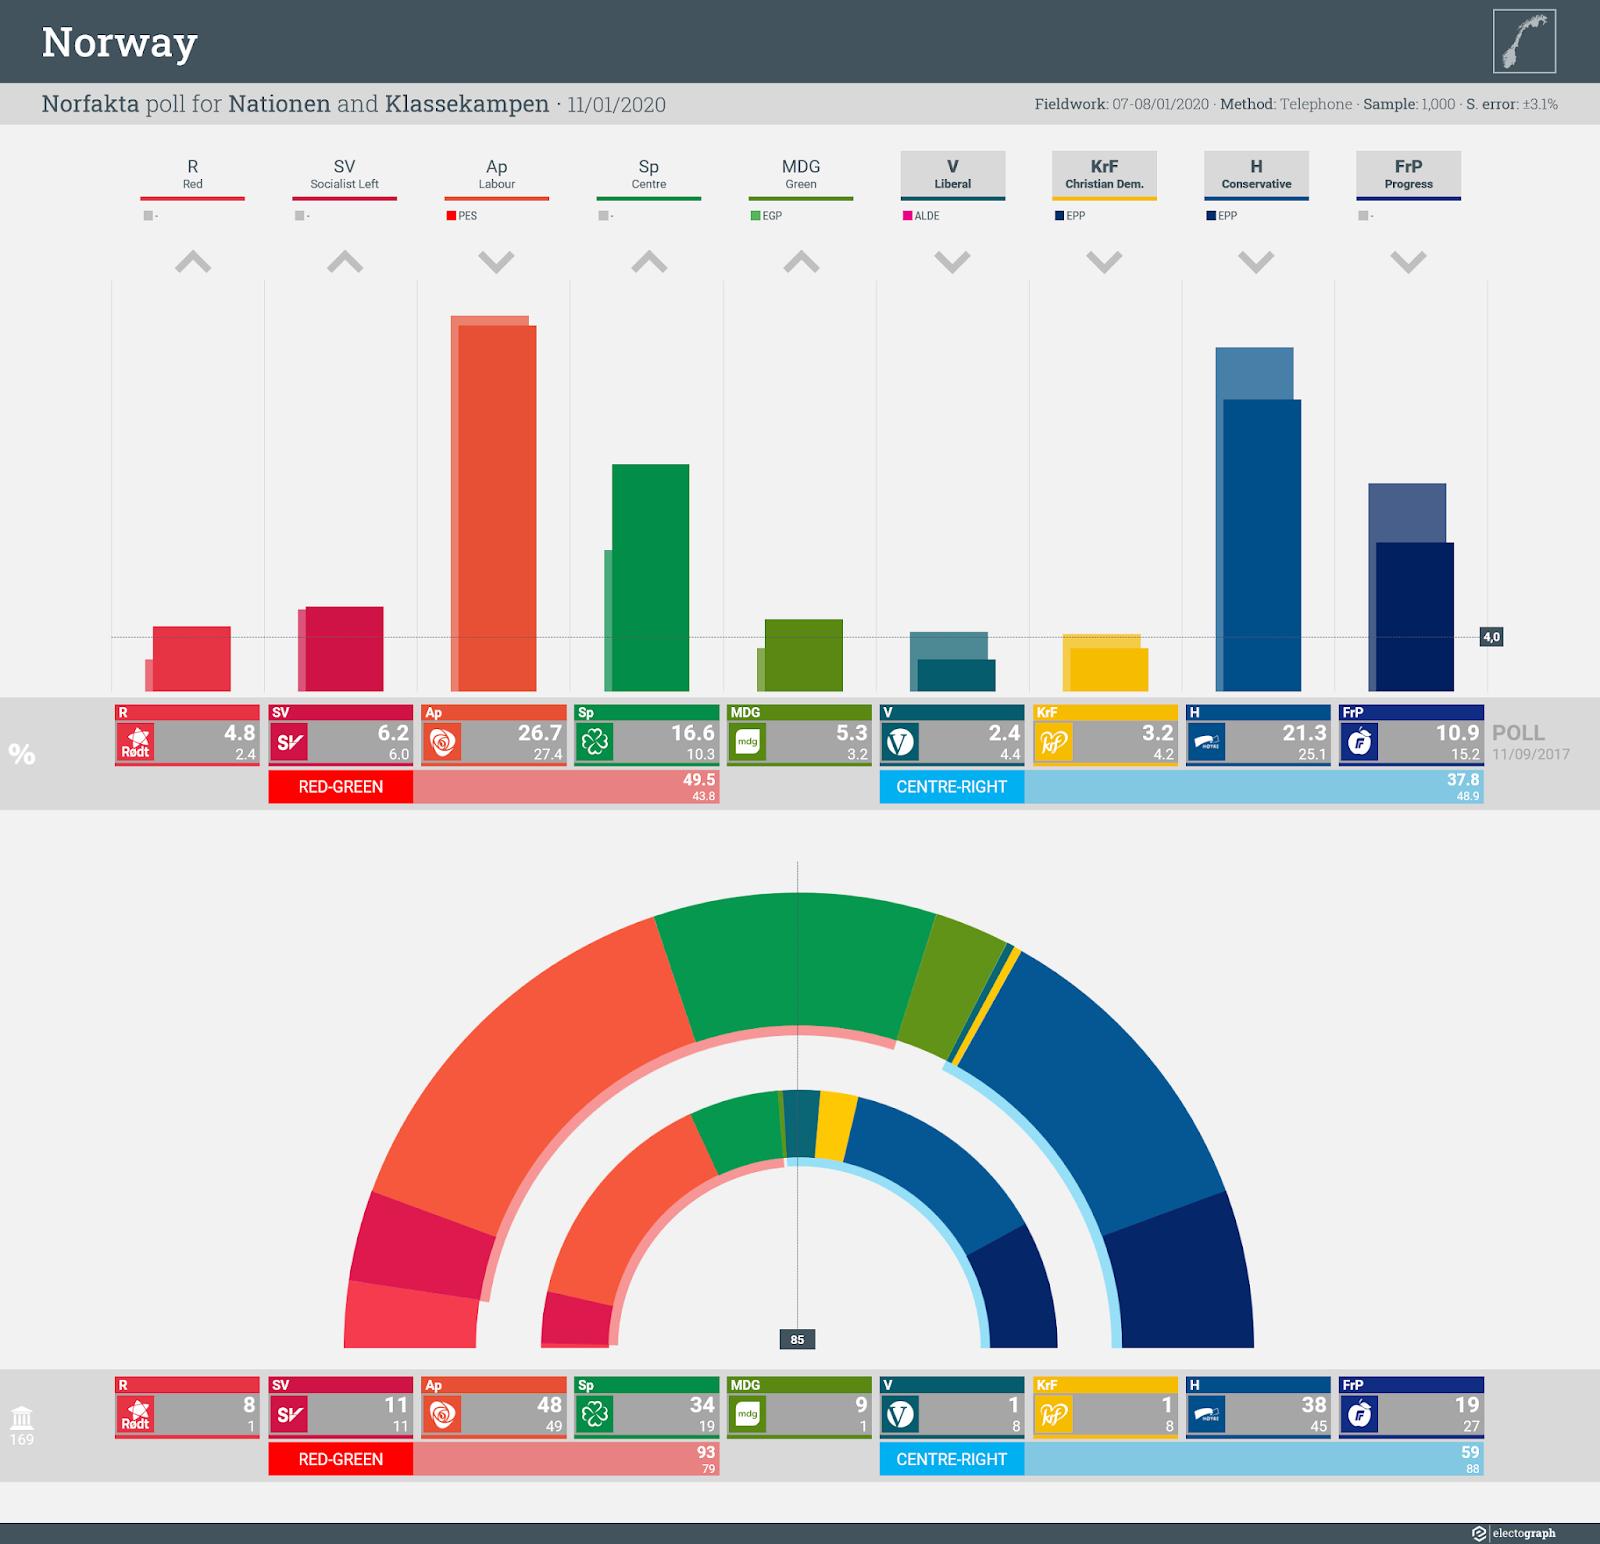 NORWAY: Norfakta poll chart for Nationen and Klassekampen, 11 January 2020